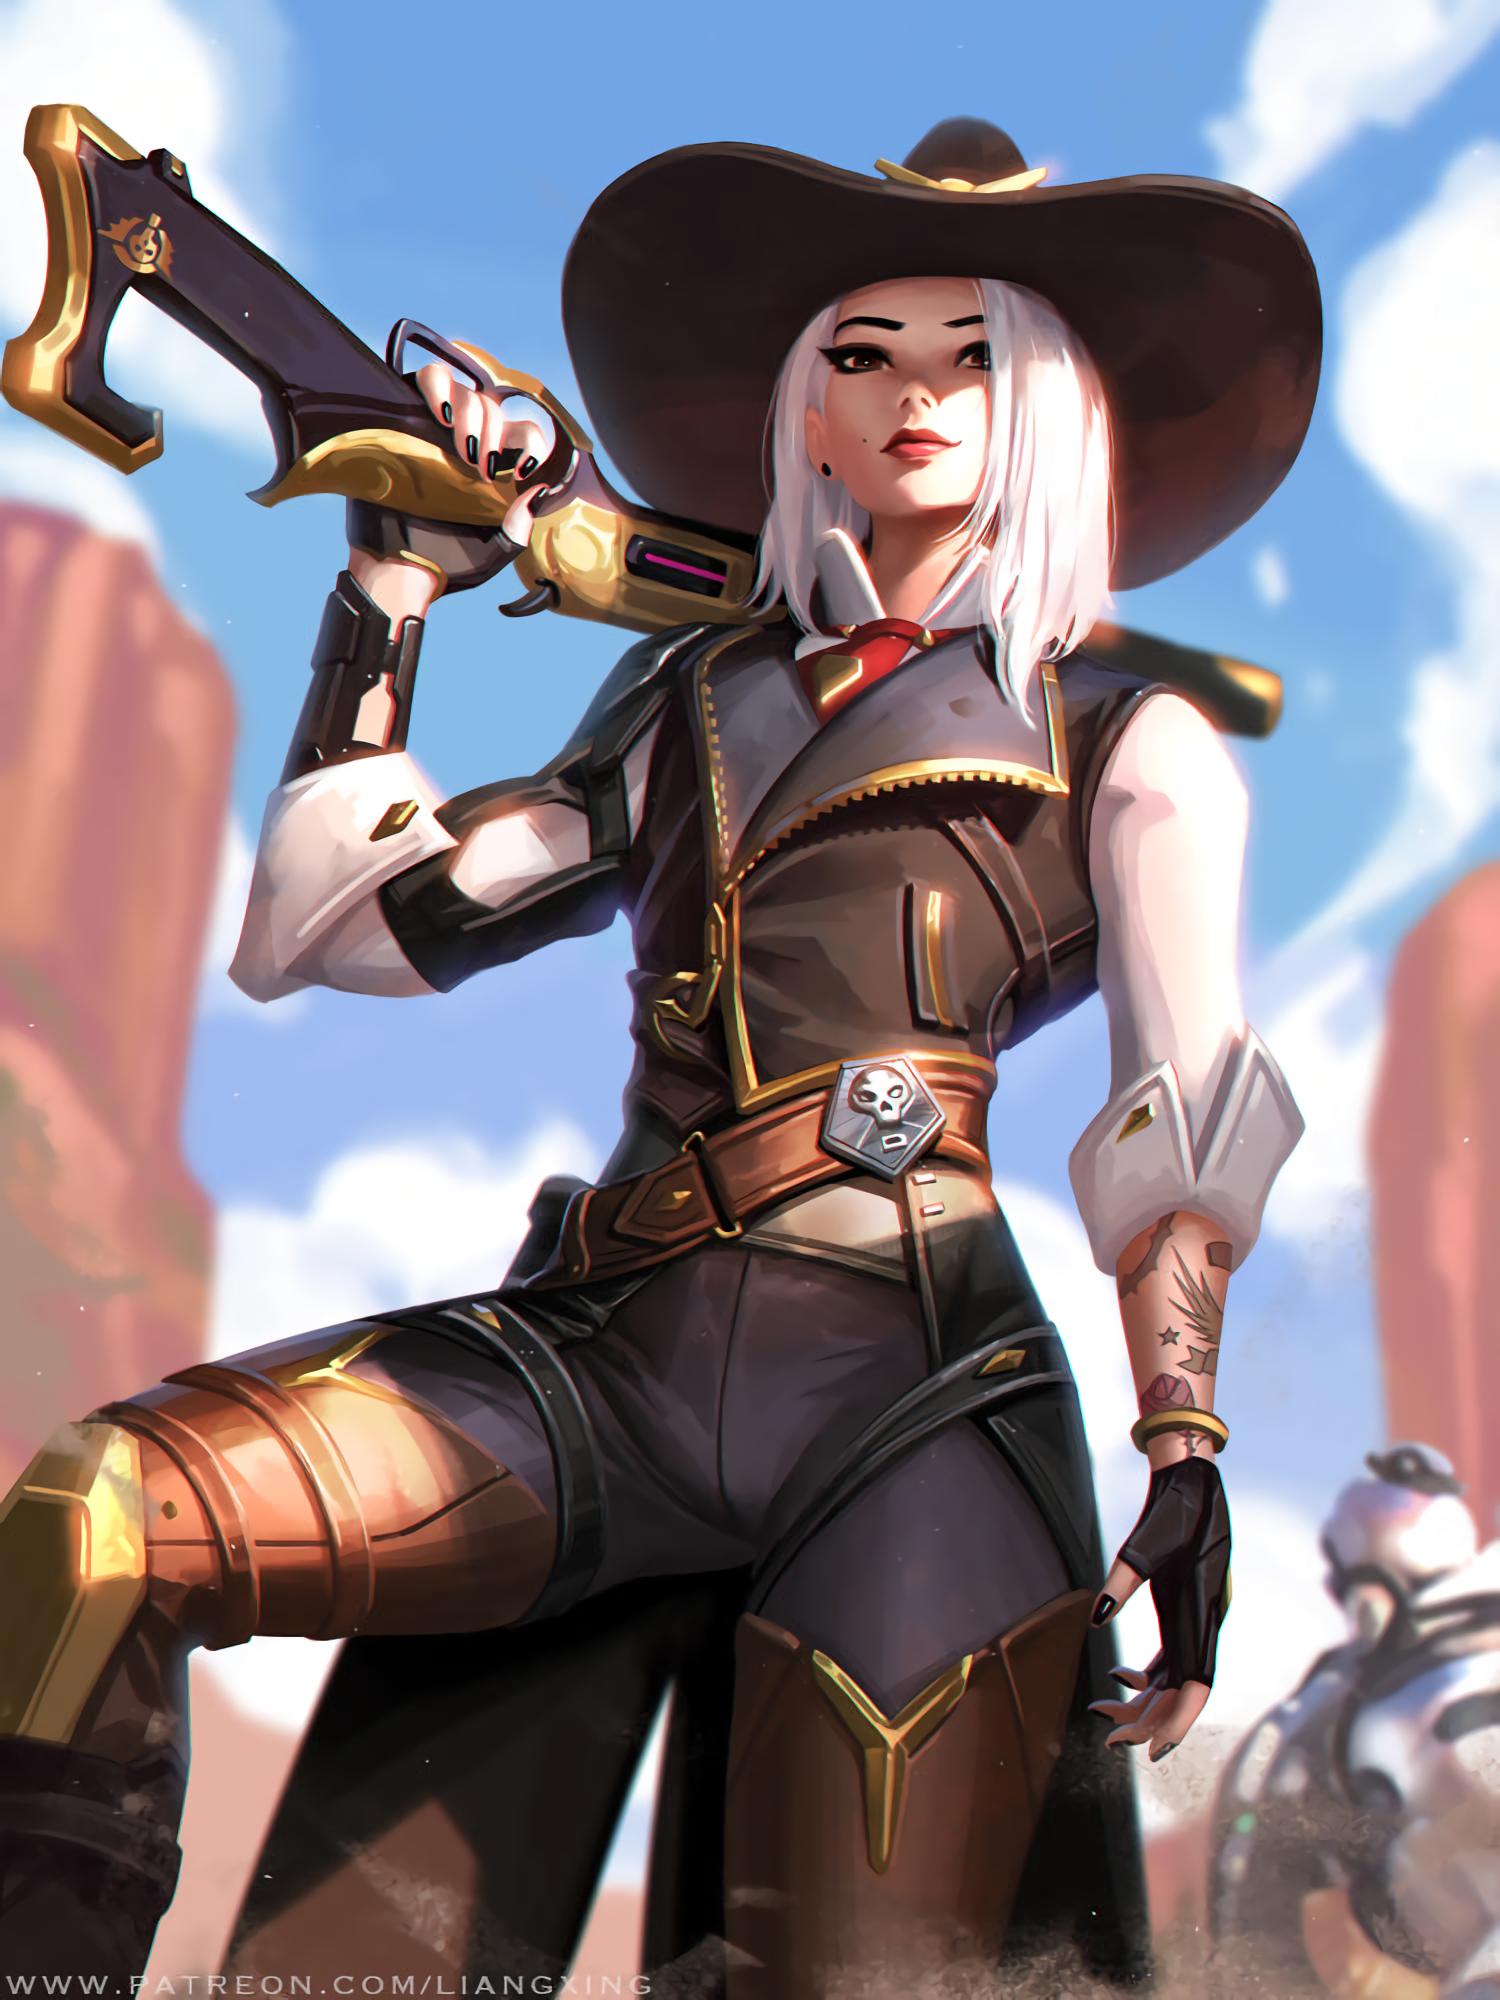 Wallpaper  Ashe Overwatch, Cowboys, Blonde, Liang Xing, Girls With Guns 1500X2000 -5394